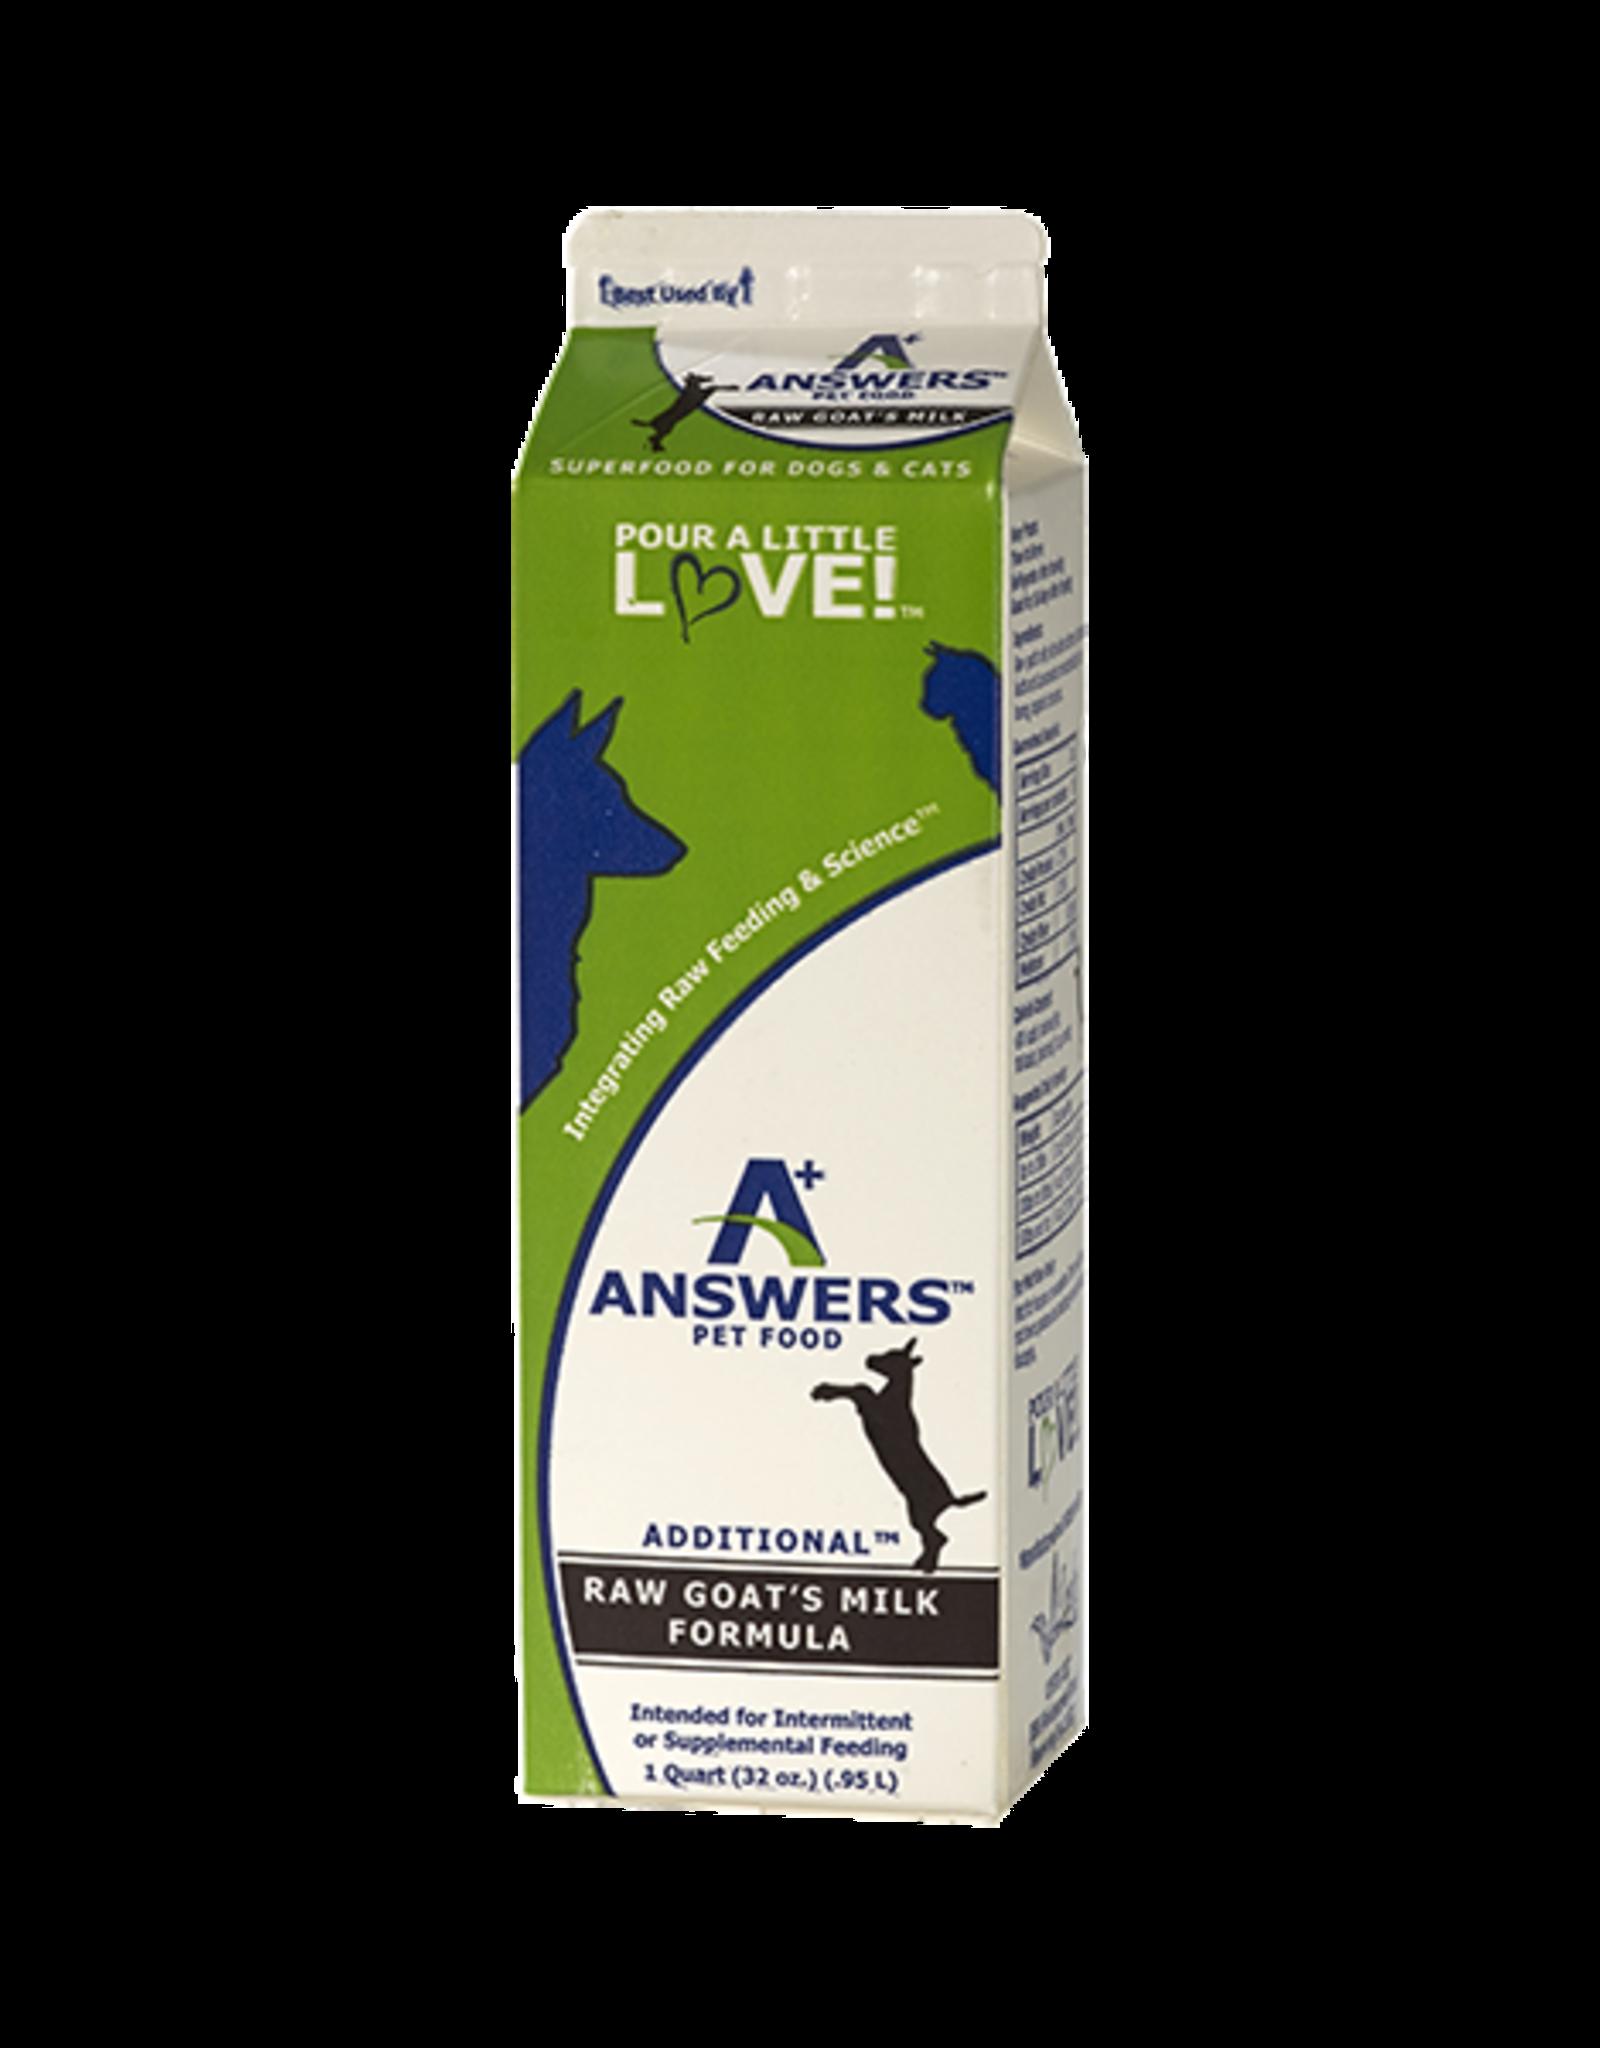 Answers Answers Additional Raw Goat Milk Formula Quart / 32 oz